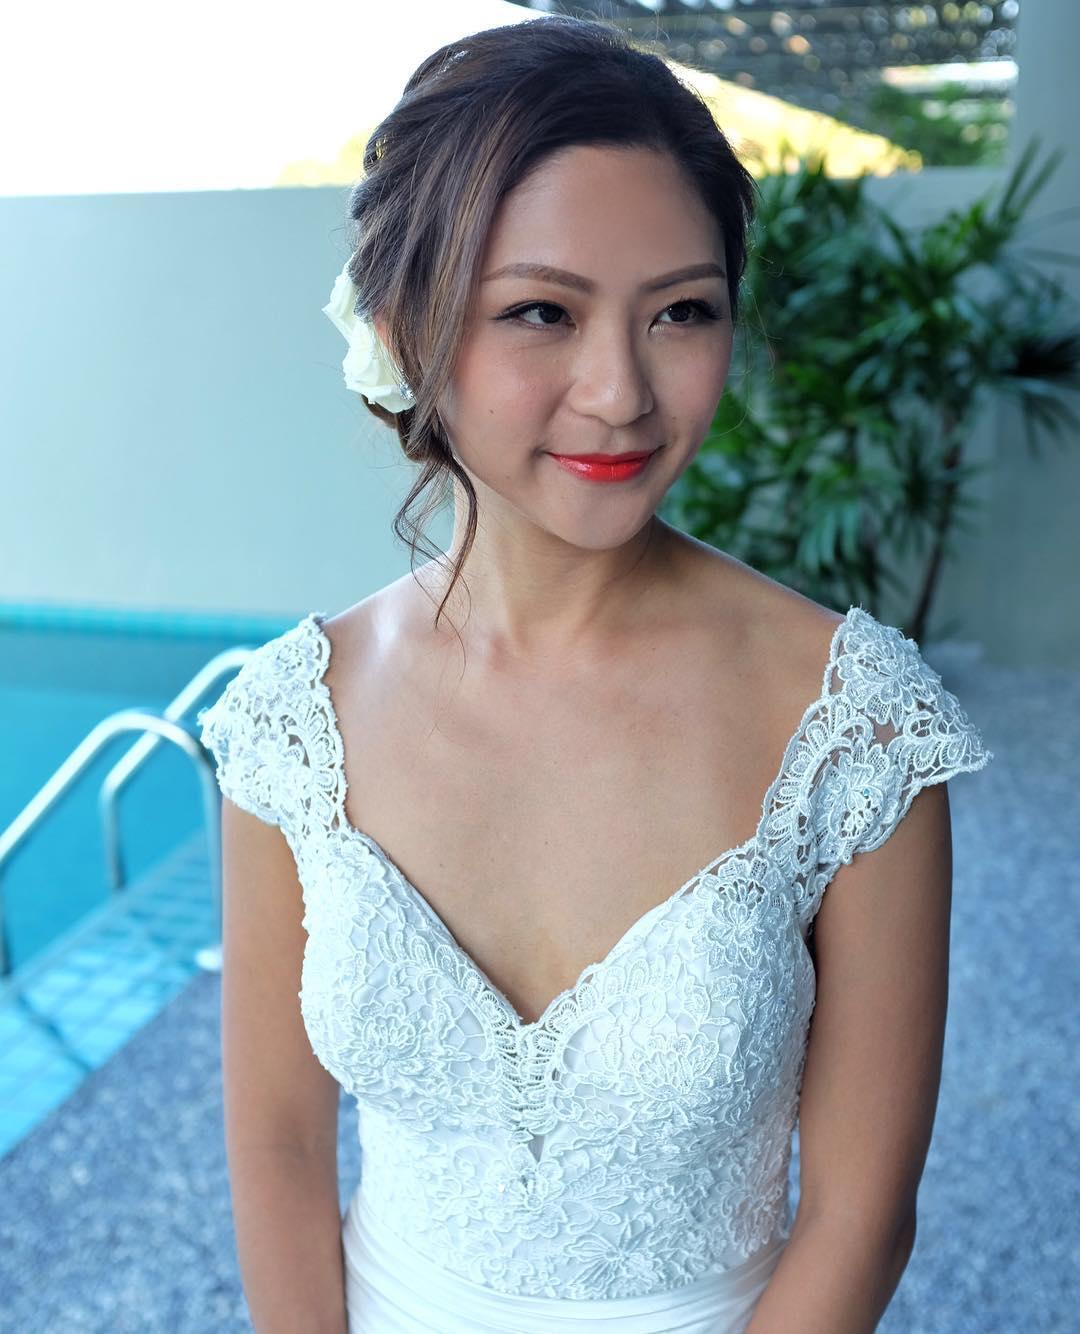 classy bridal hairstyle idea